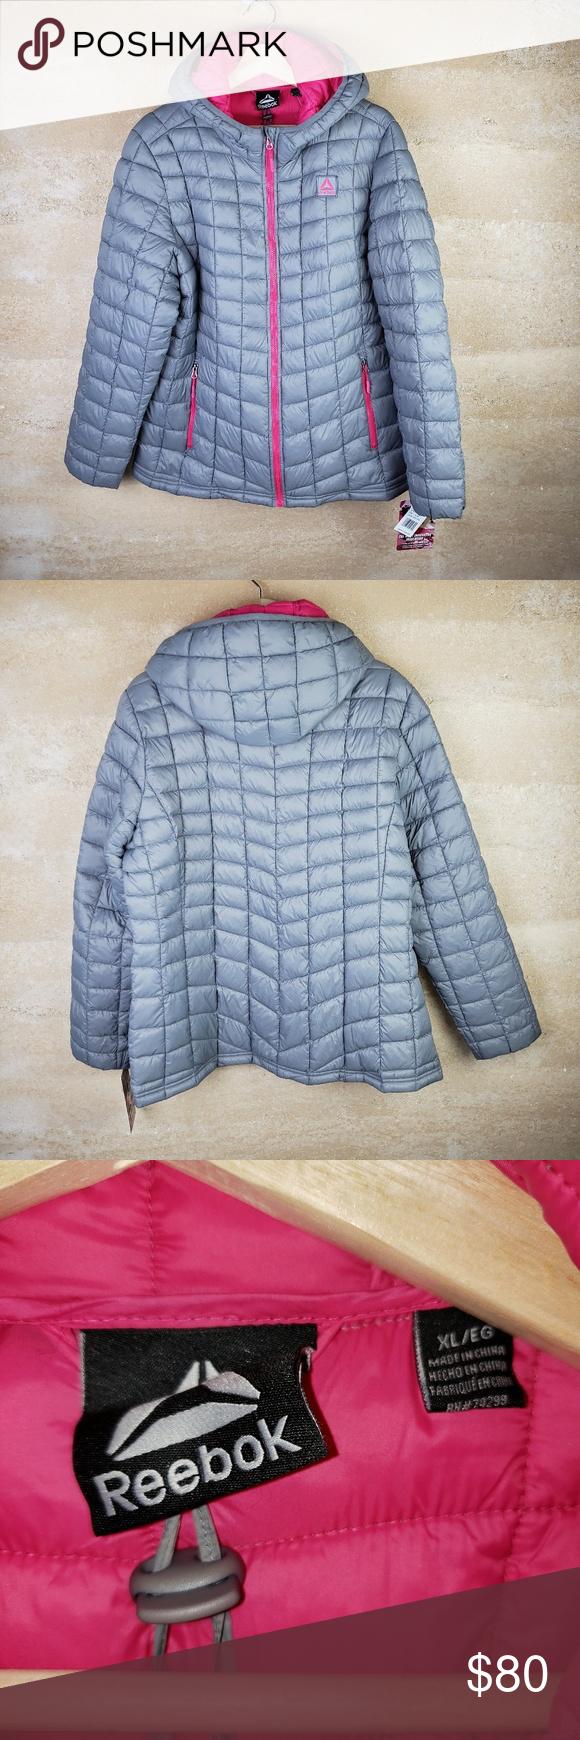 Reebok Nwt Puffer Jacket Xl Gray And Pink Puffer Jackets Jackets Clothes Design [ 1740 x 580 Pixel ]